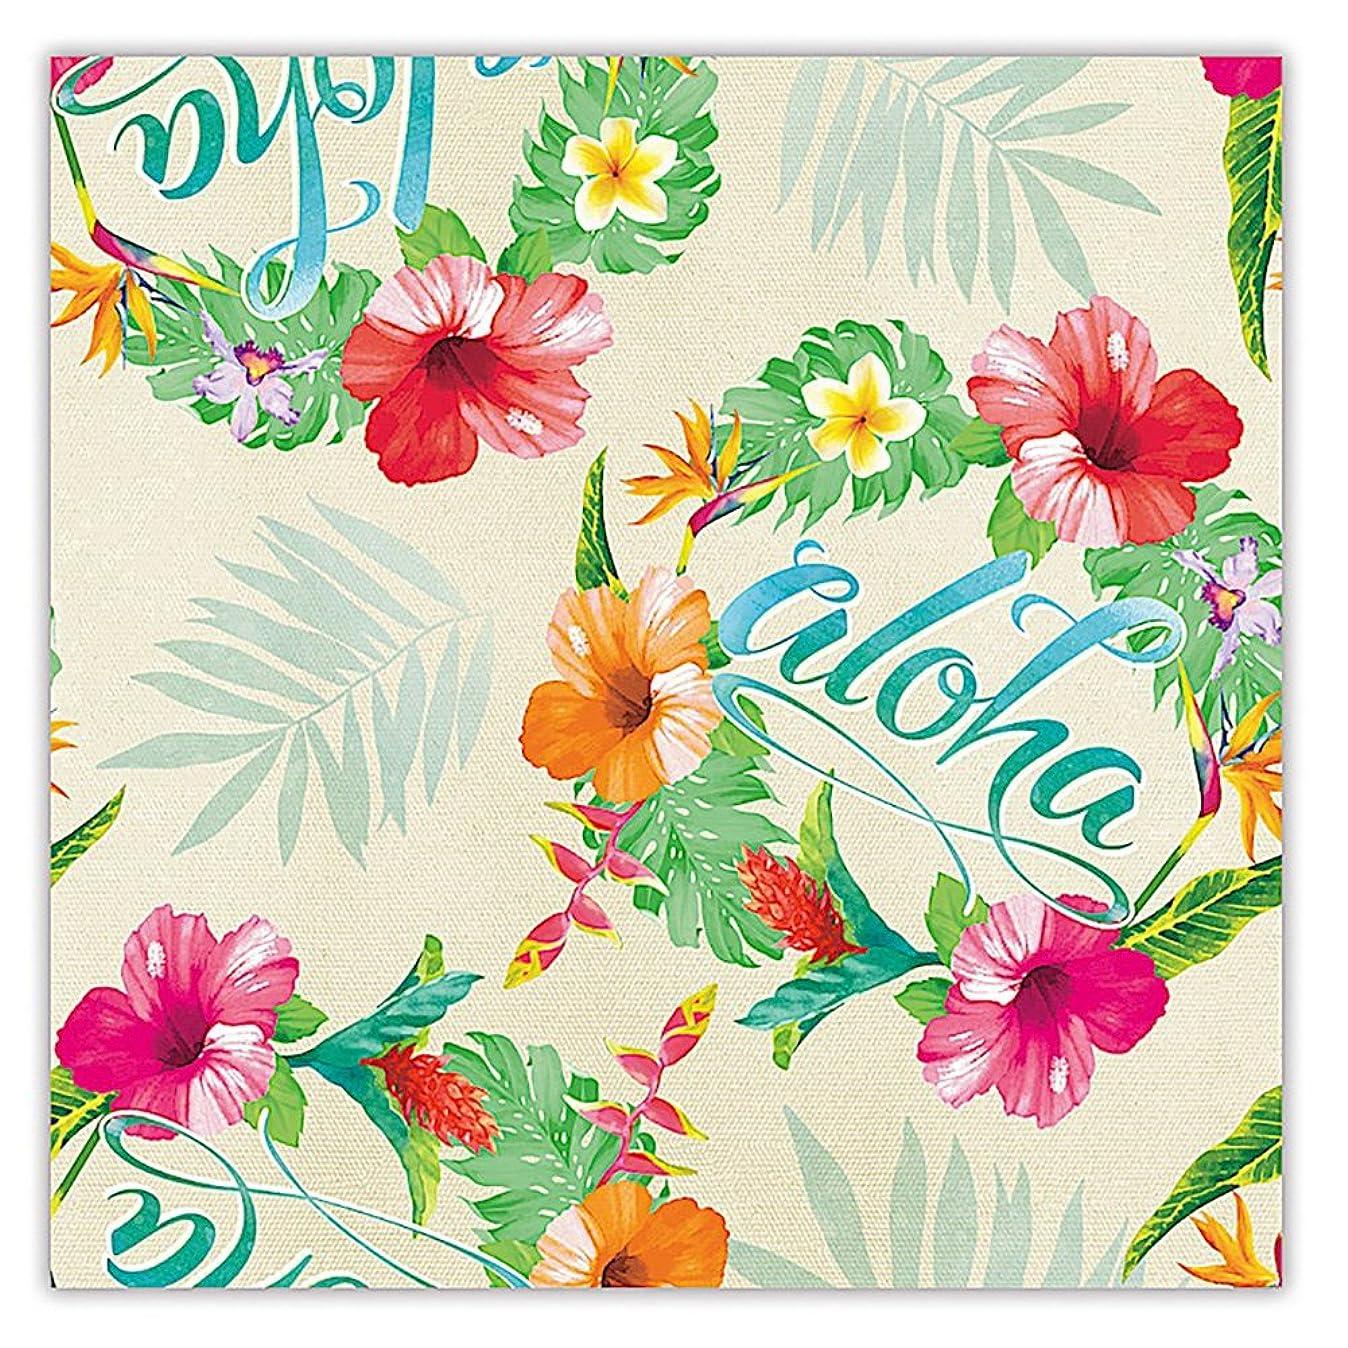 Aloha Floral Hawaiian Tropical Gift Wrap Paper / 2 Rolls v6255798811